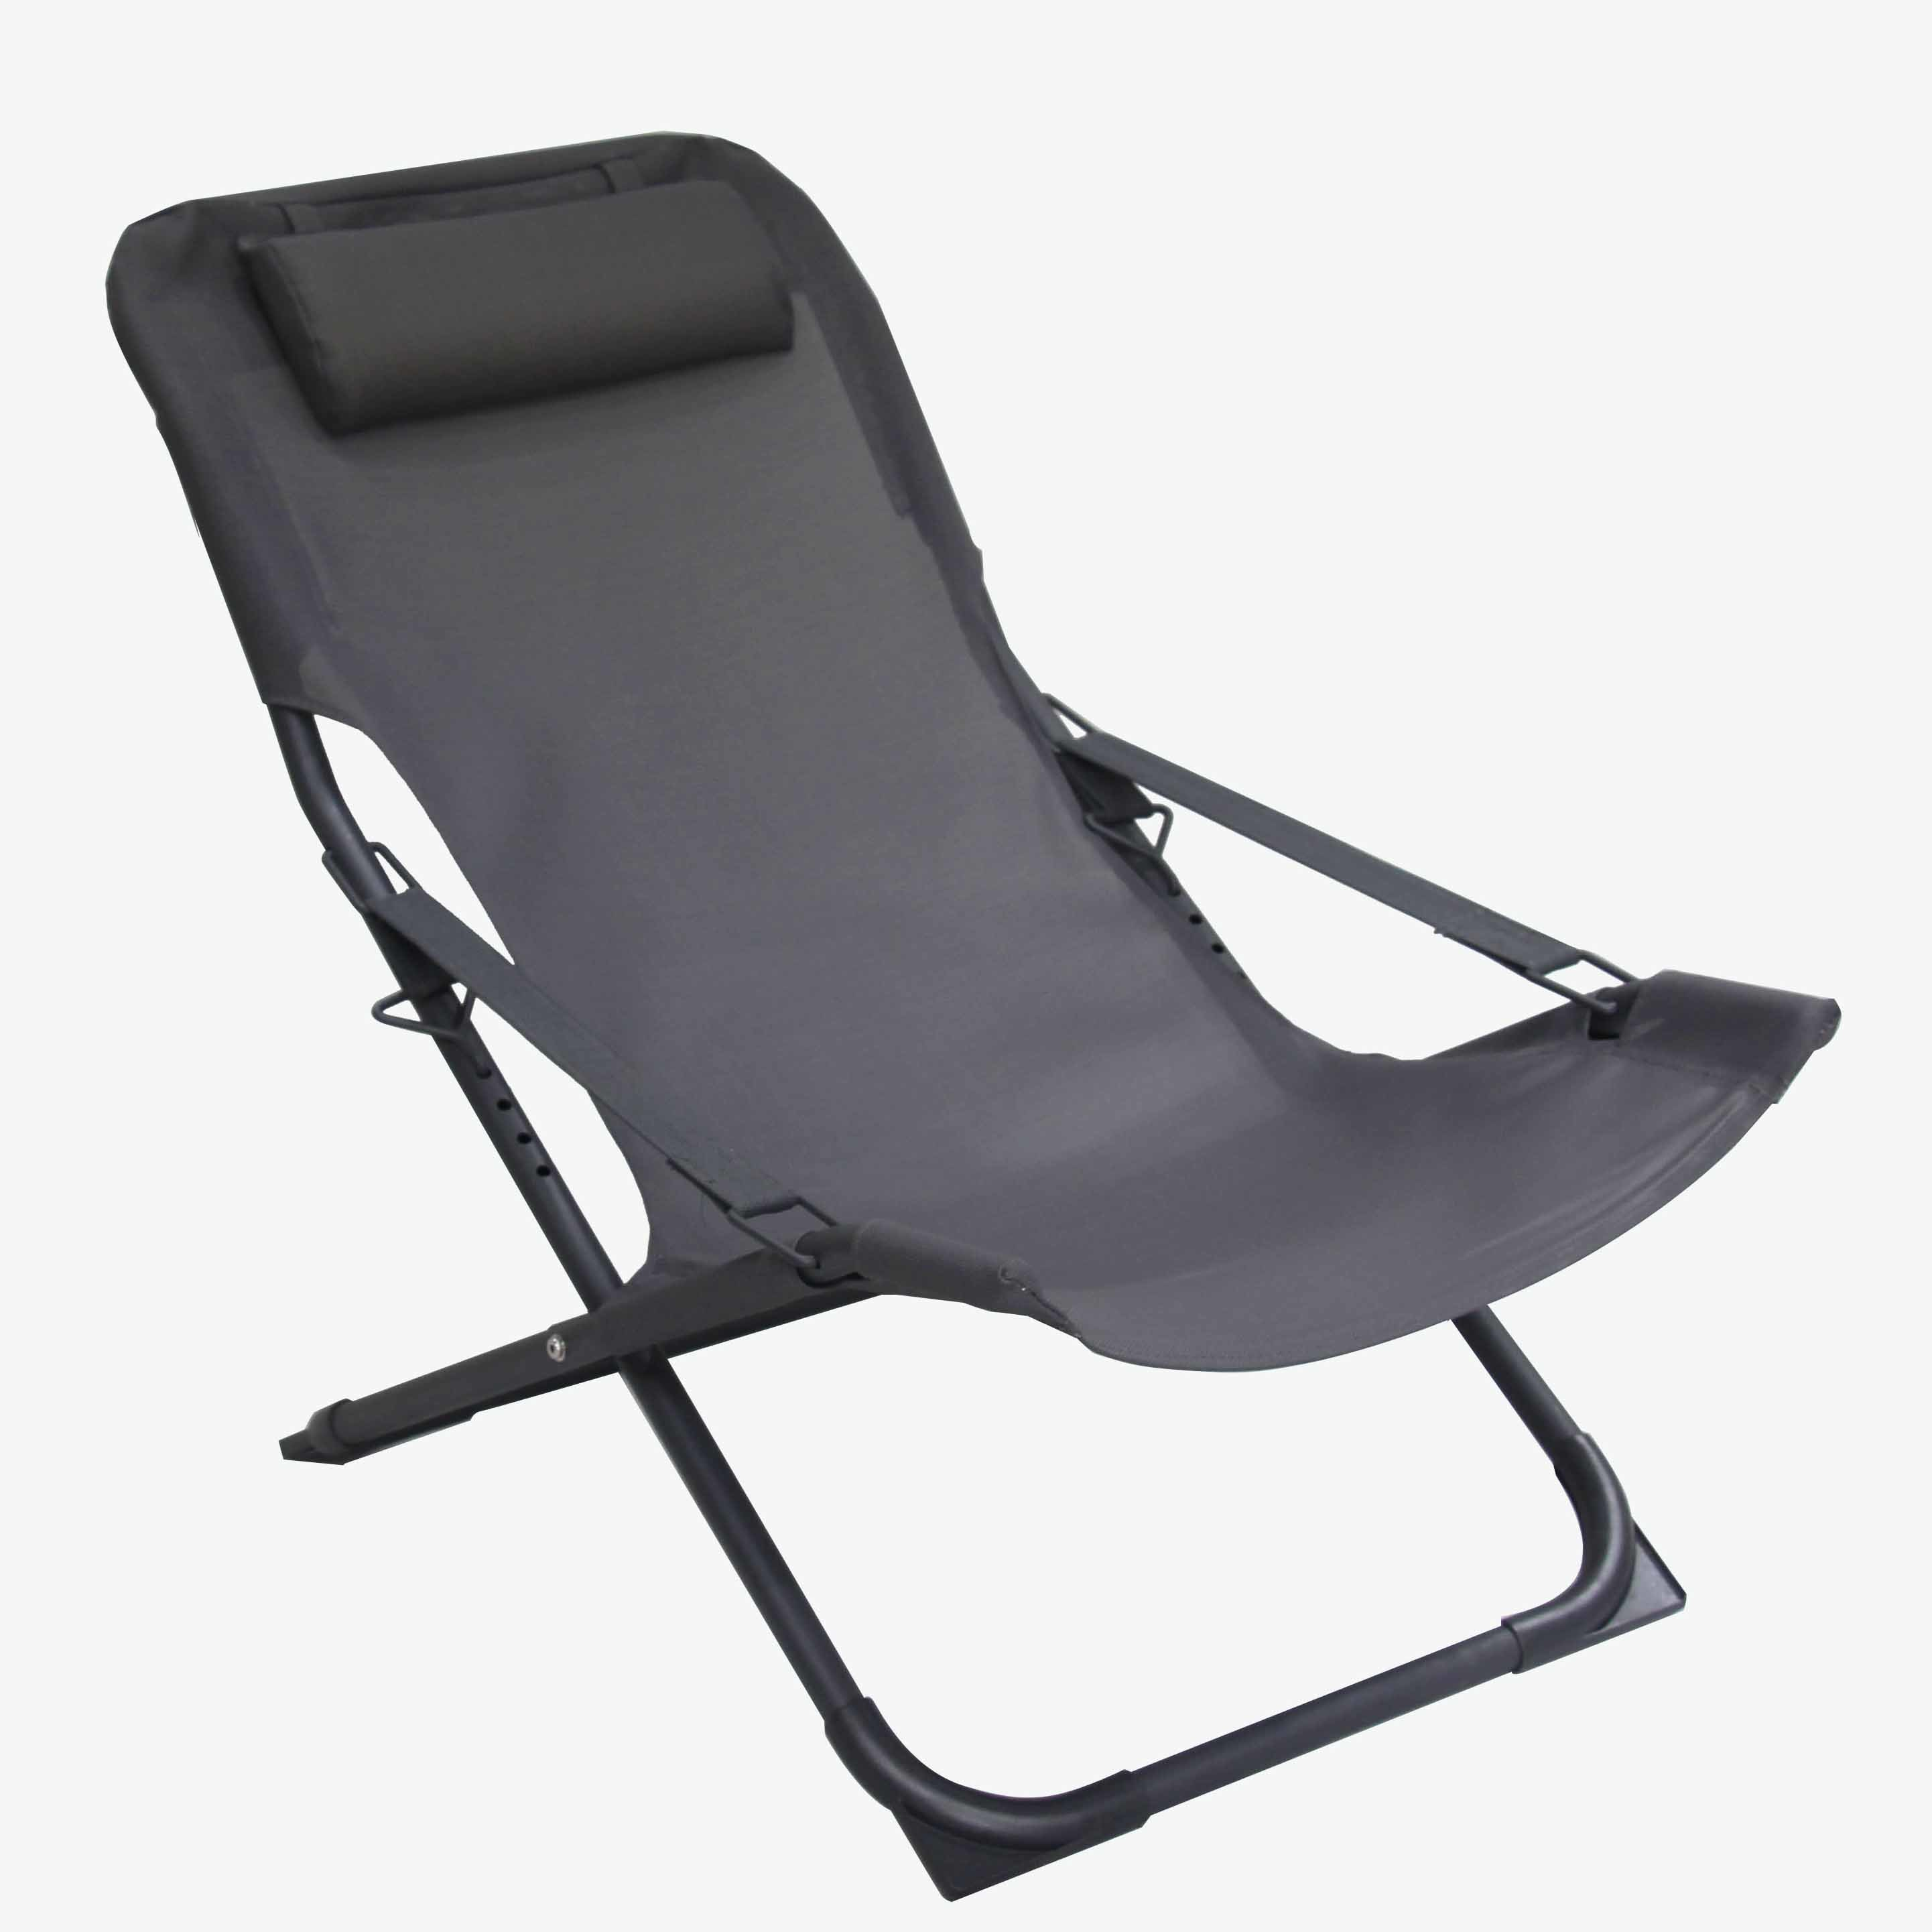 Modern Euro Outdoor Patio Furniture Garden Aluminum Sling Chairs